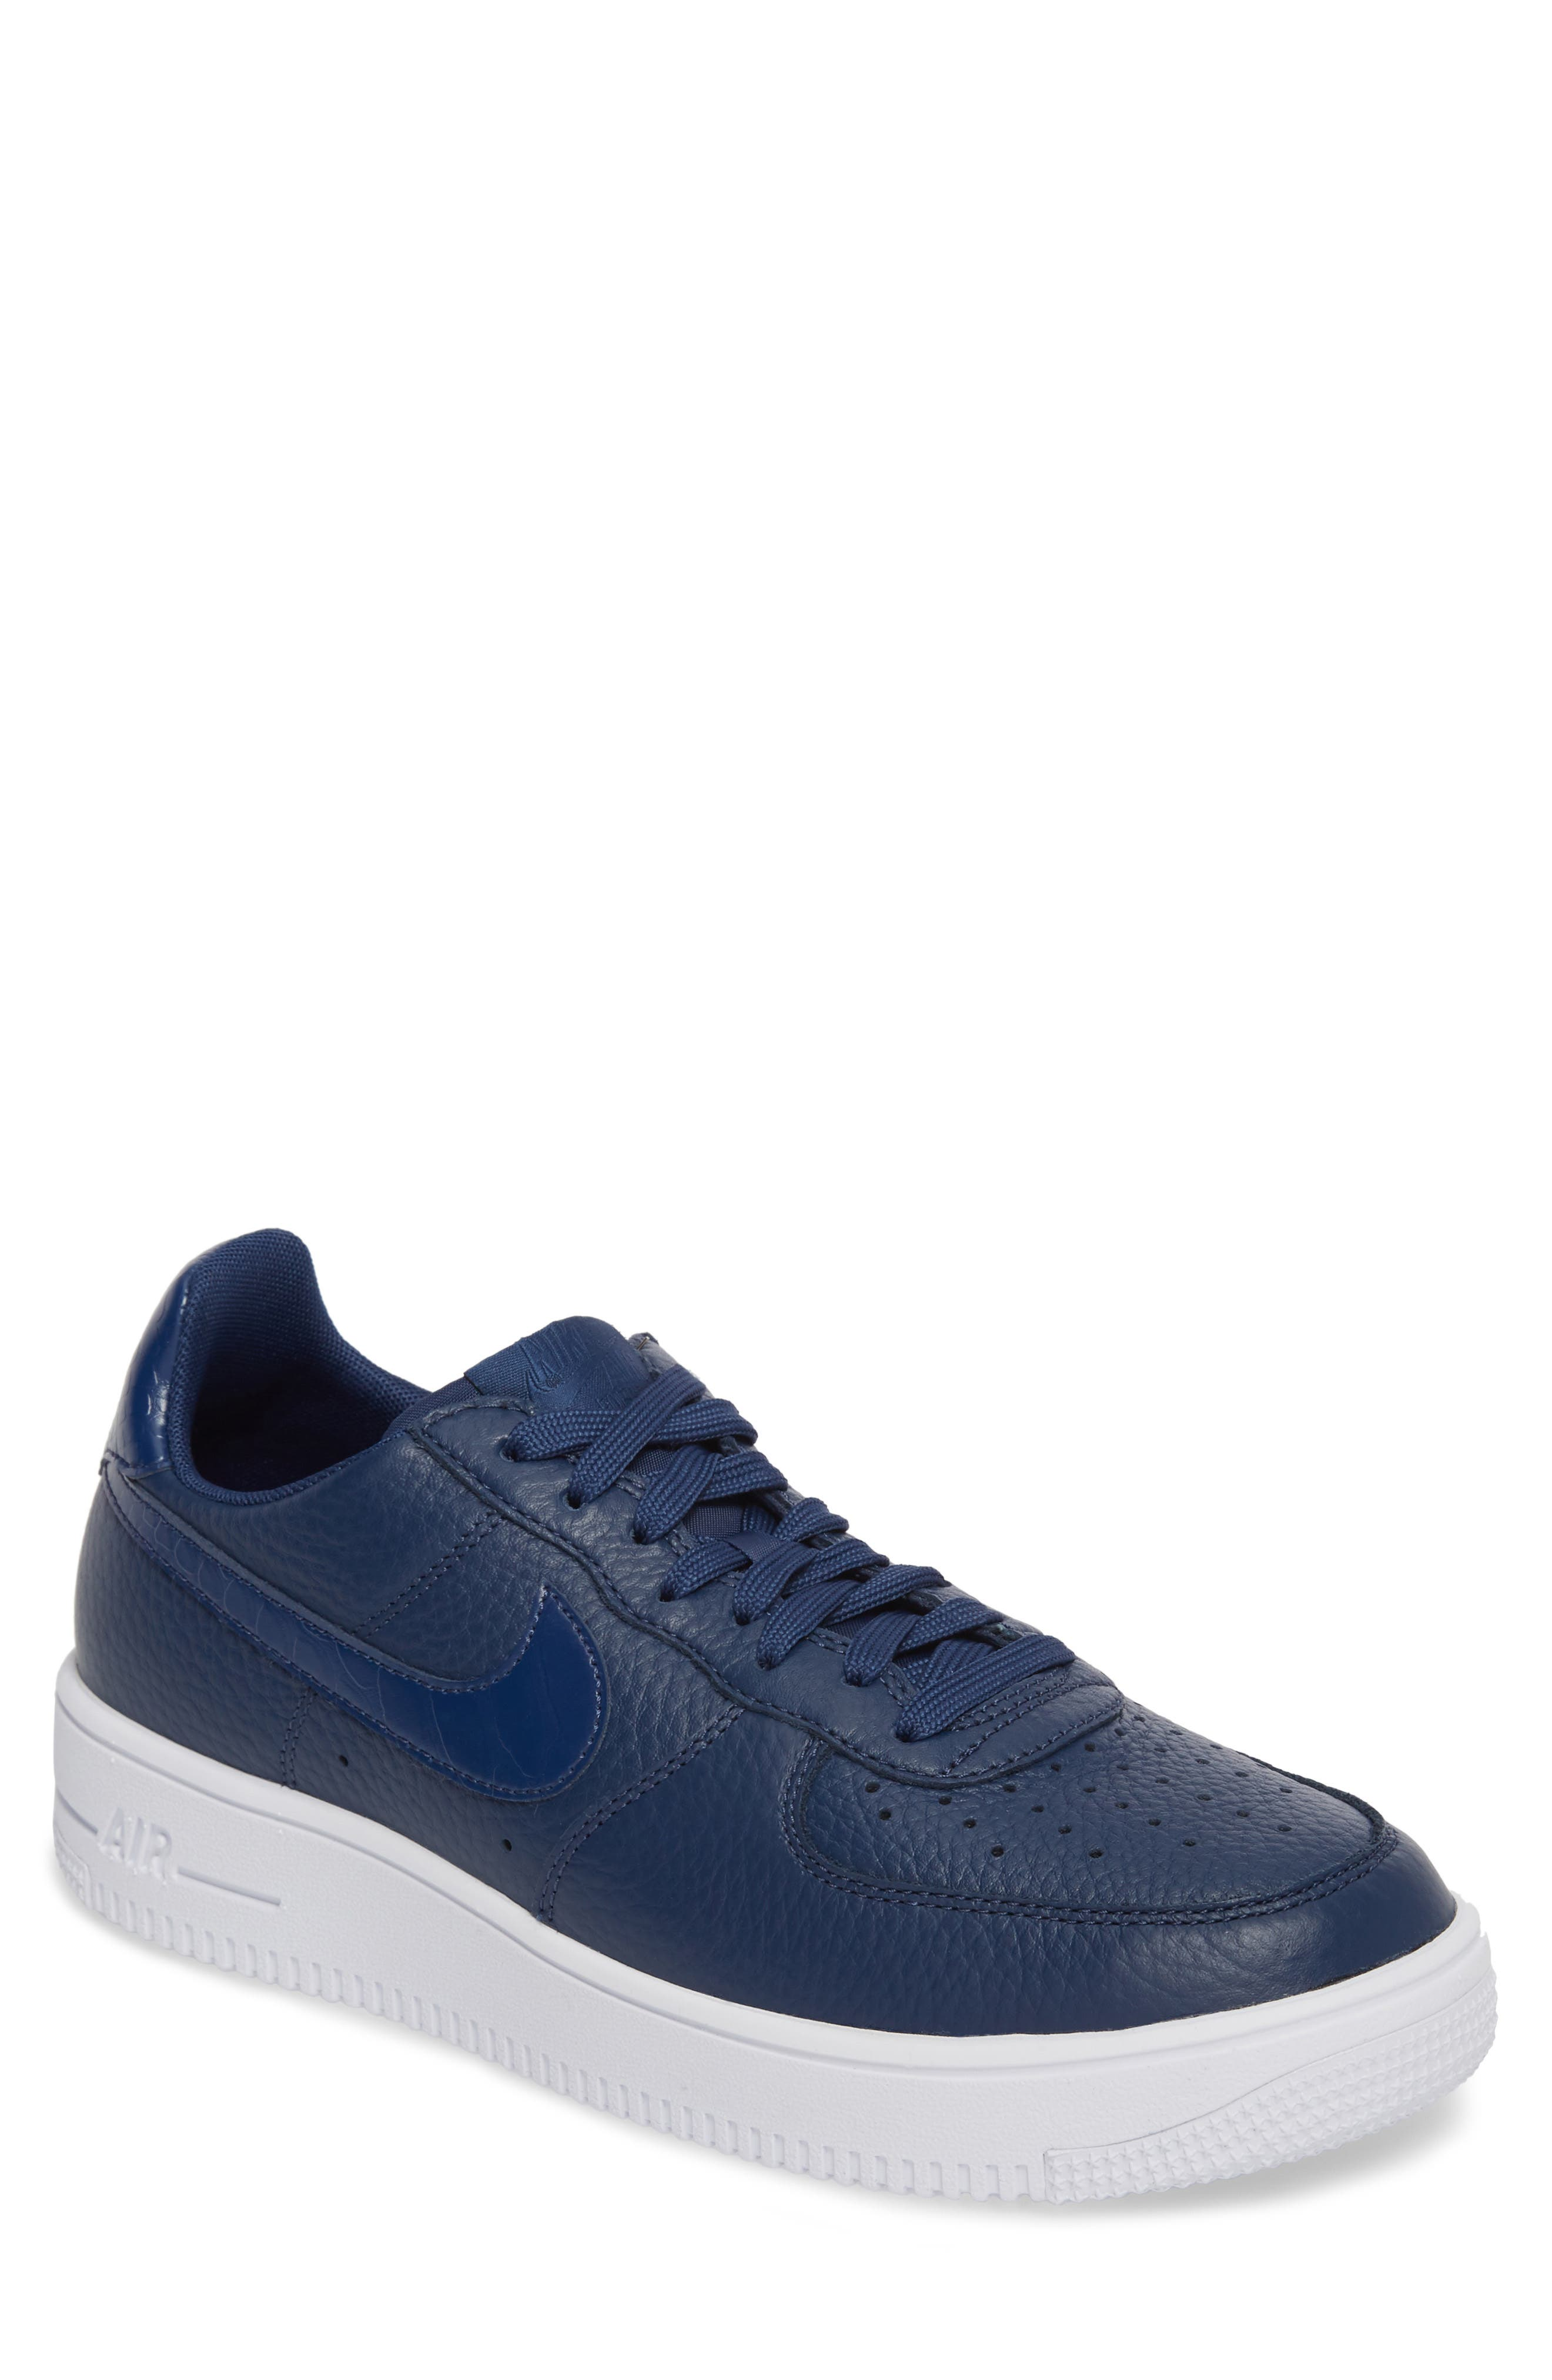 Nike Air Force 1 Ultraforce Sneaker (Men)